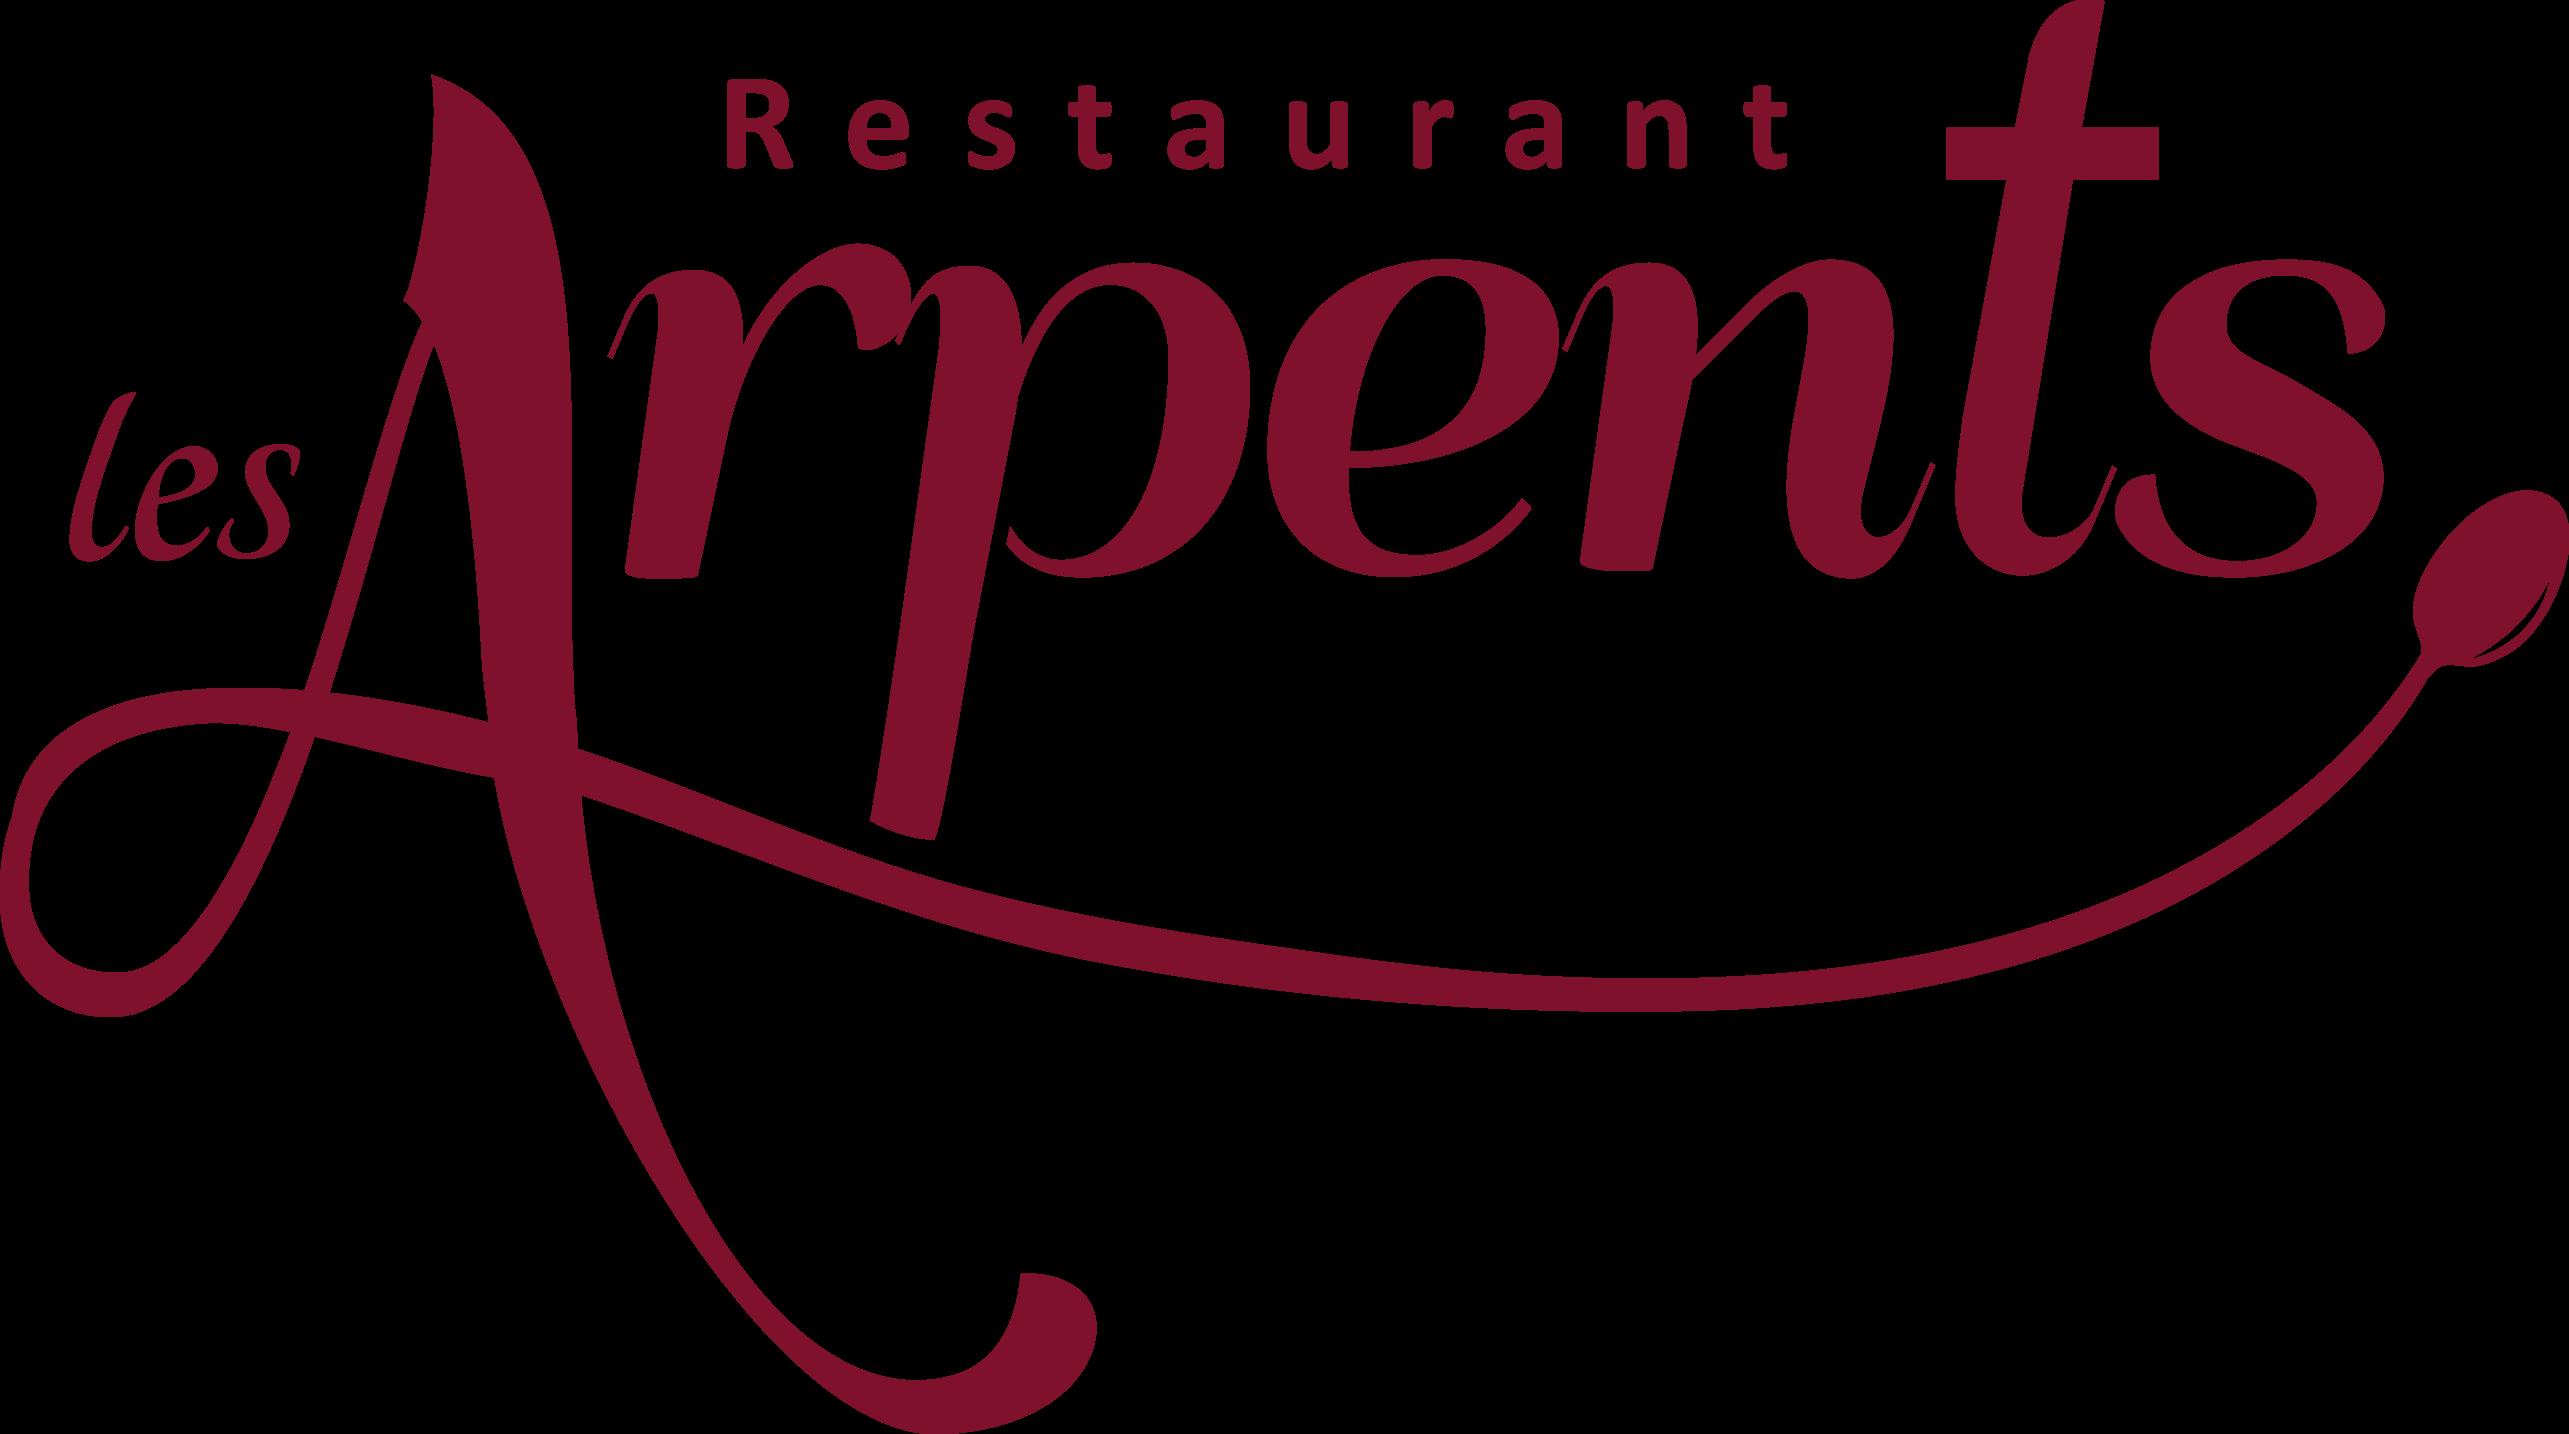 Restaurant Les Arpents Amboise